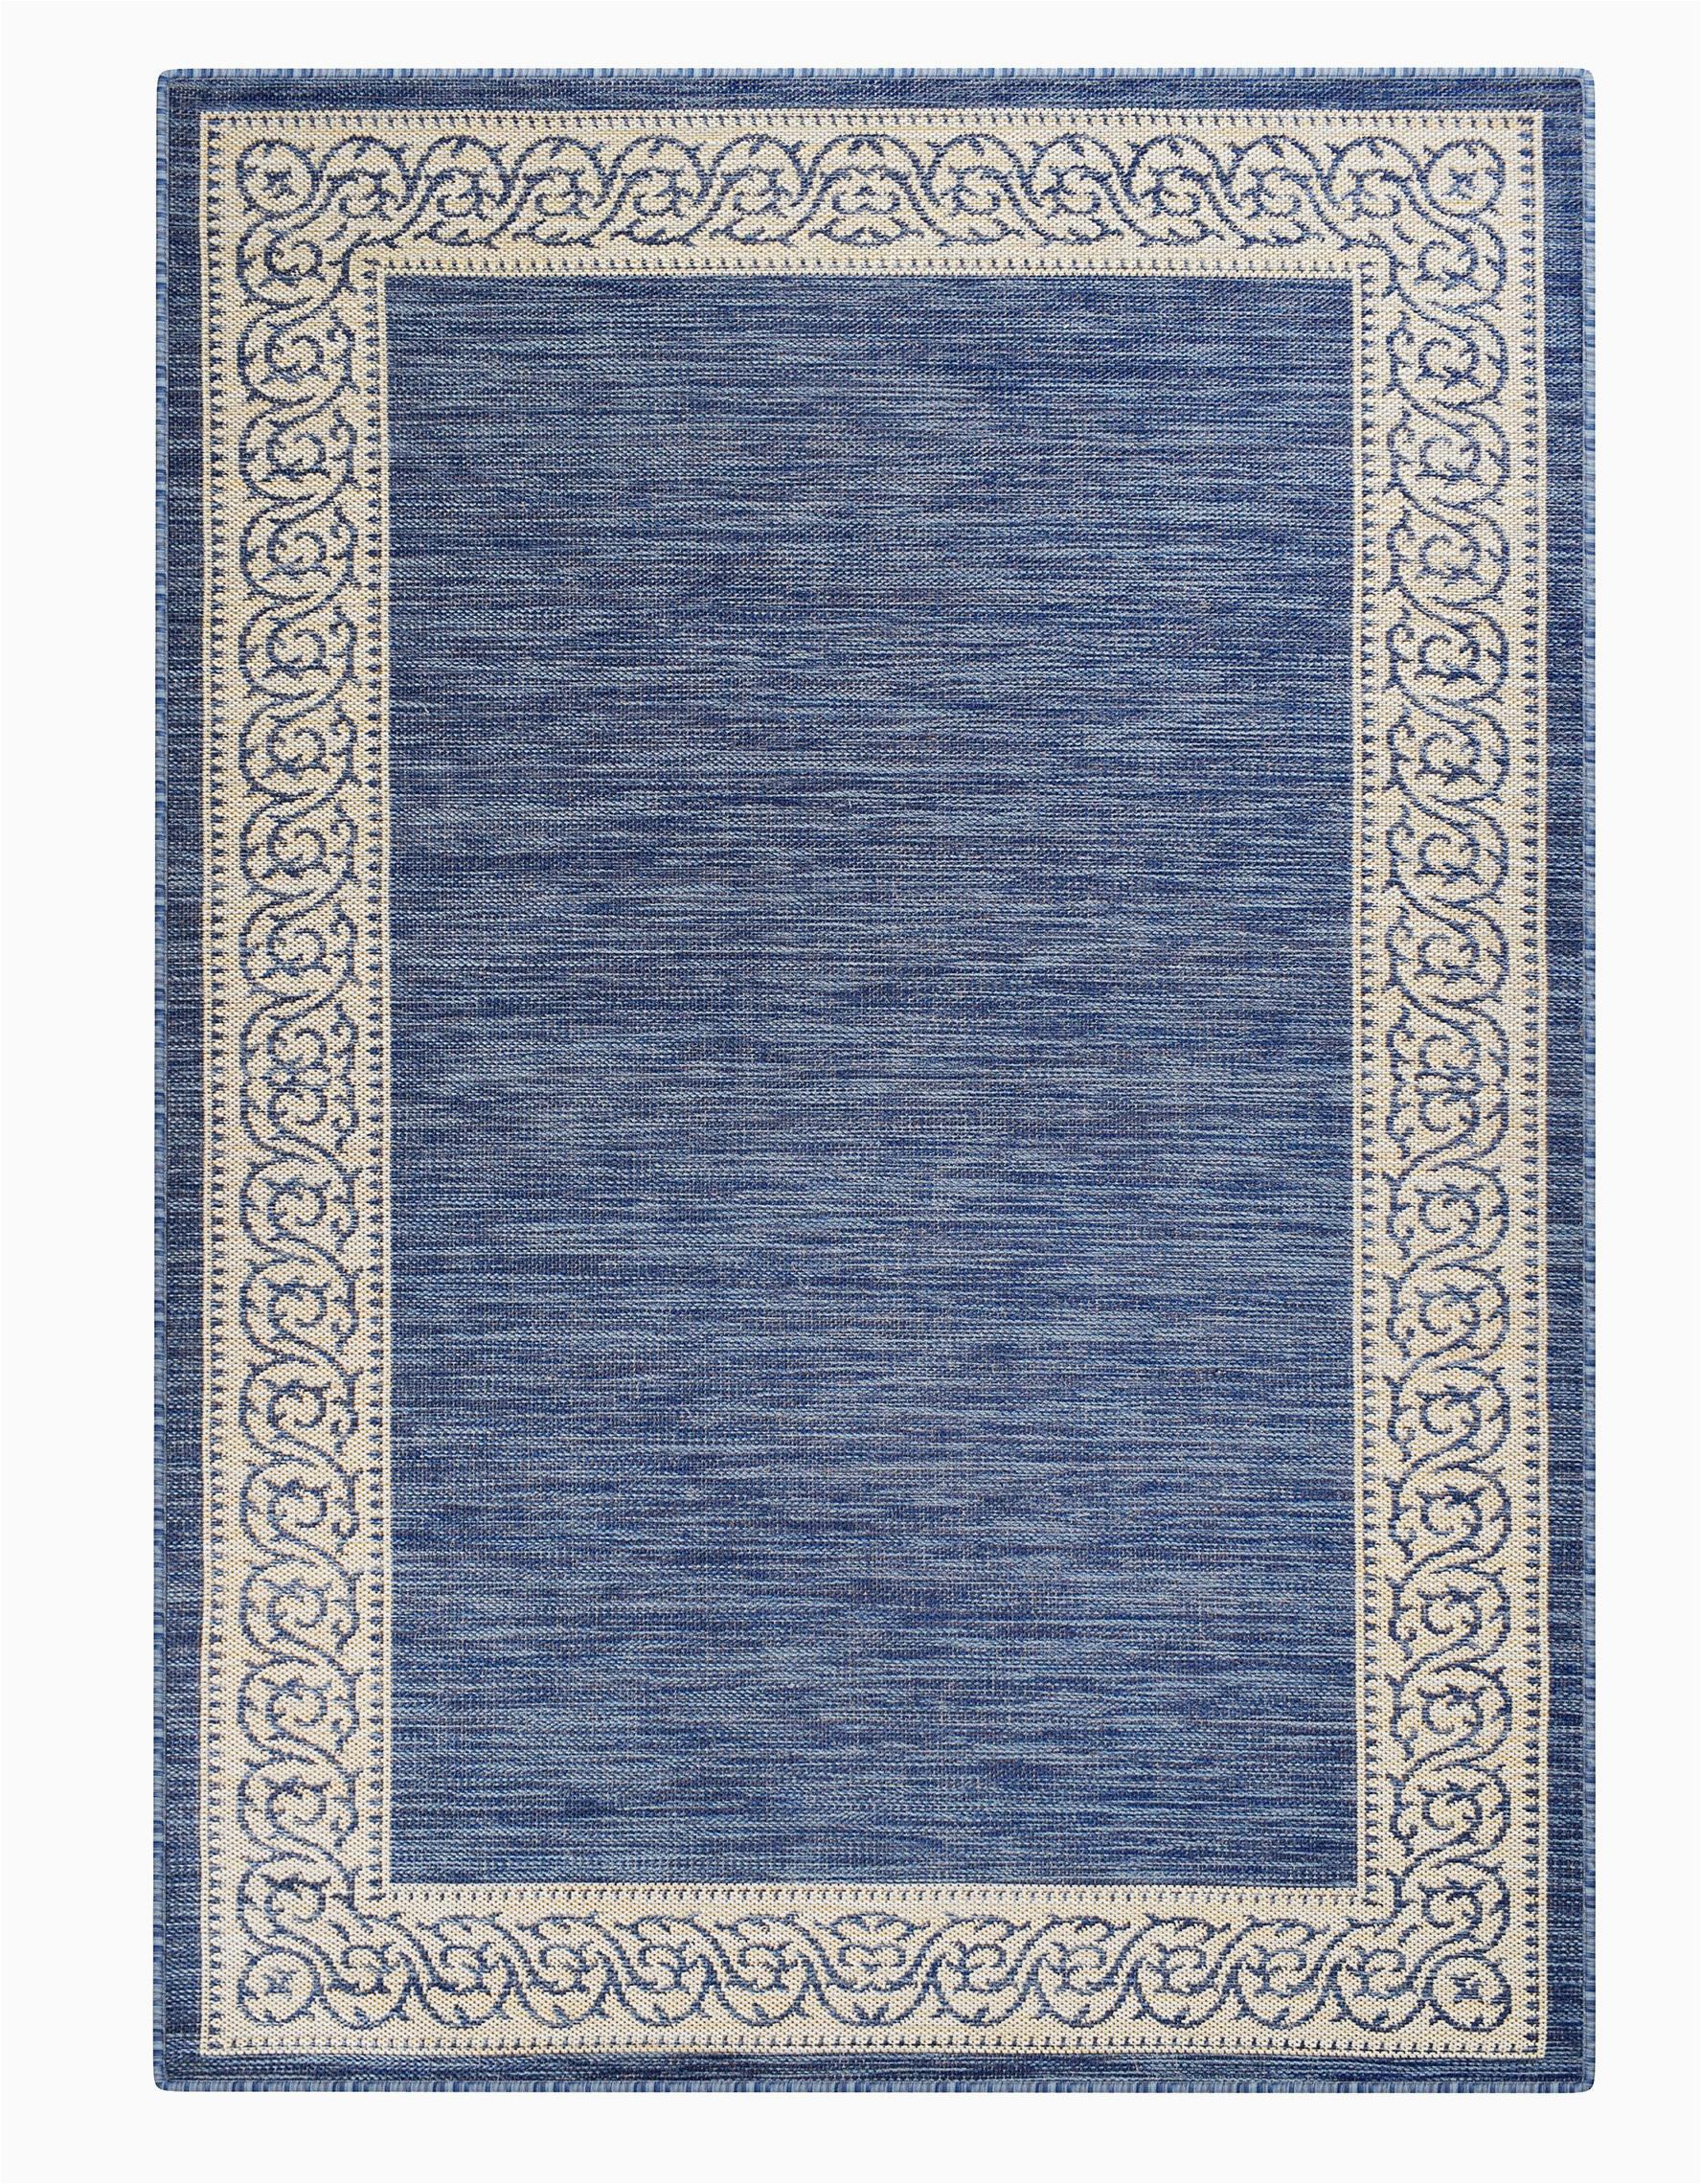 charlton home meyerwood floral shag 5 x 77 denim blue indoor outdoor area rug w002584836